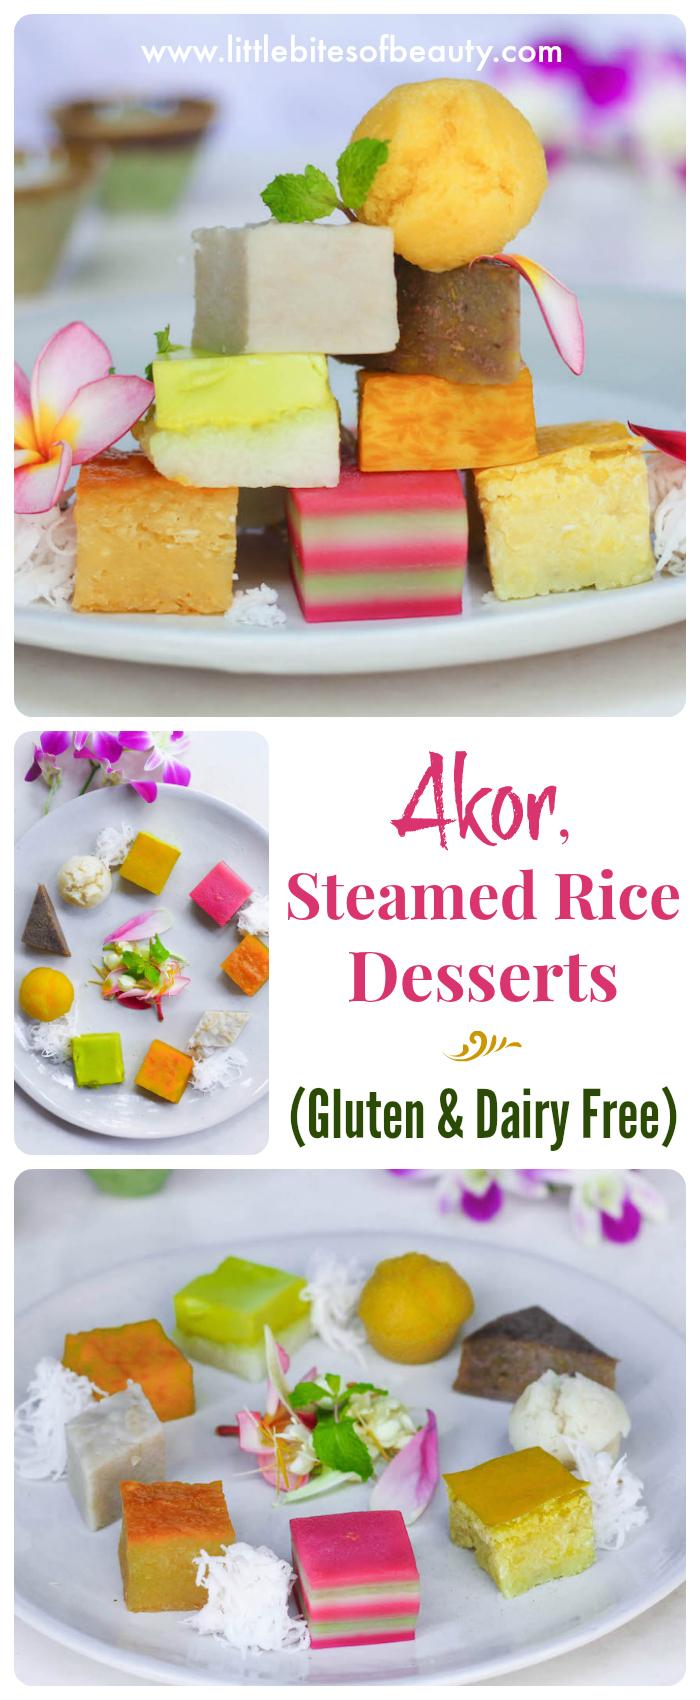 Akor. Gluten & Dairy Free Rice Desserts from Cambodia